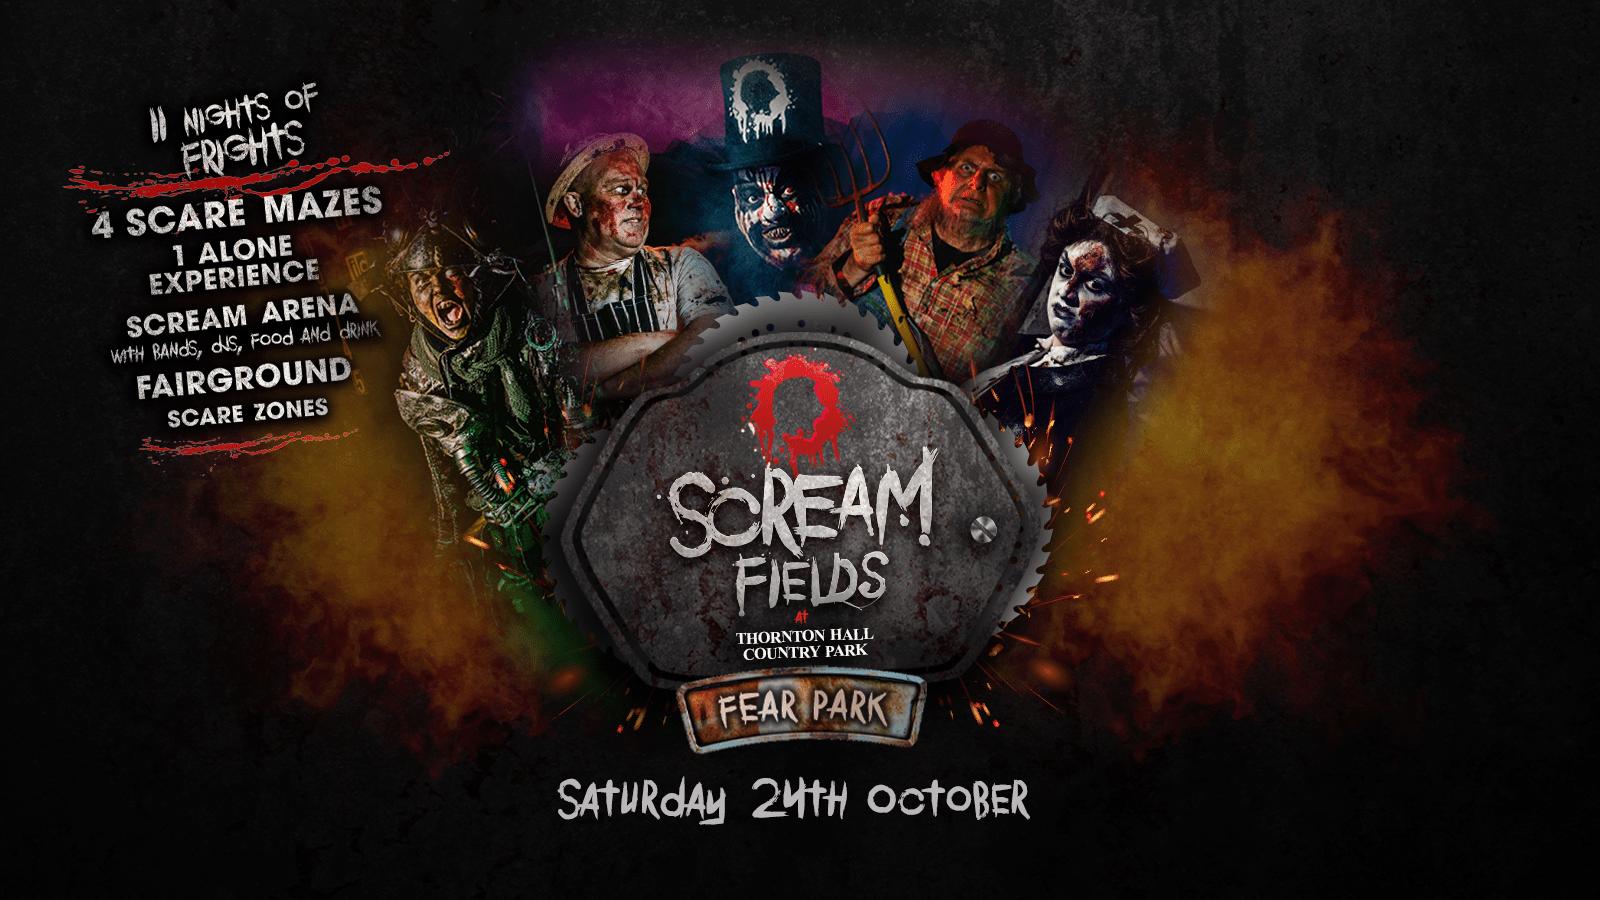 7.30PM – Screamfields: Saturday 24th October 2020